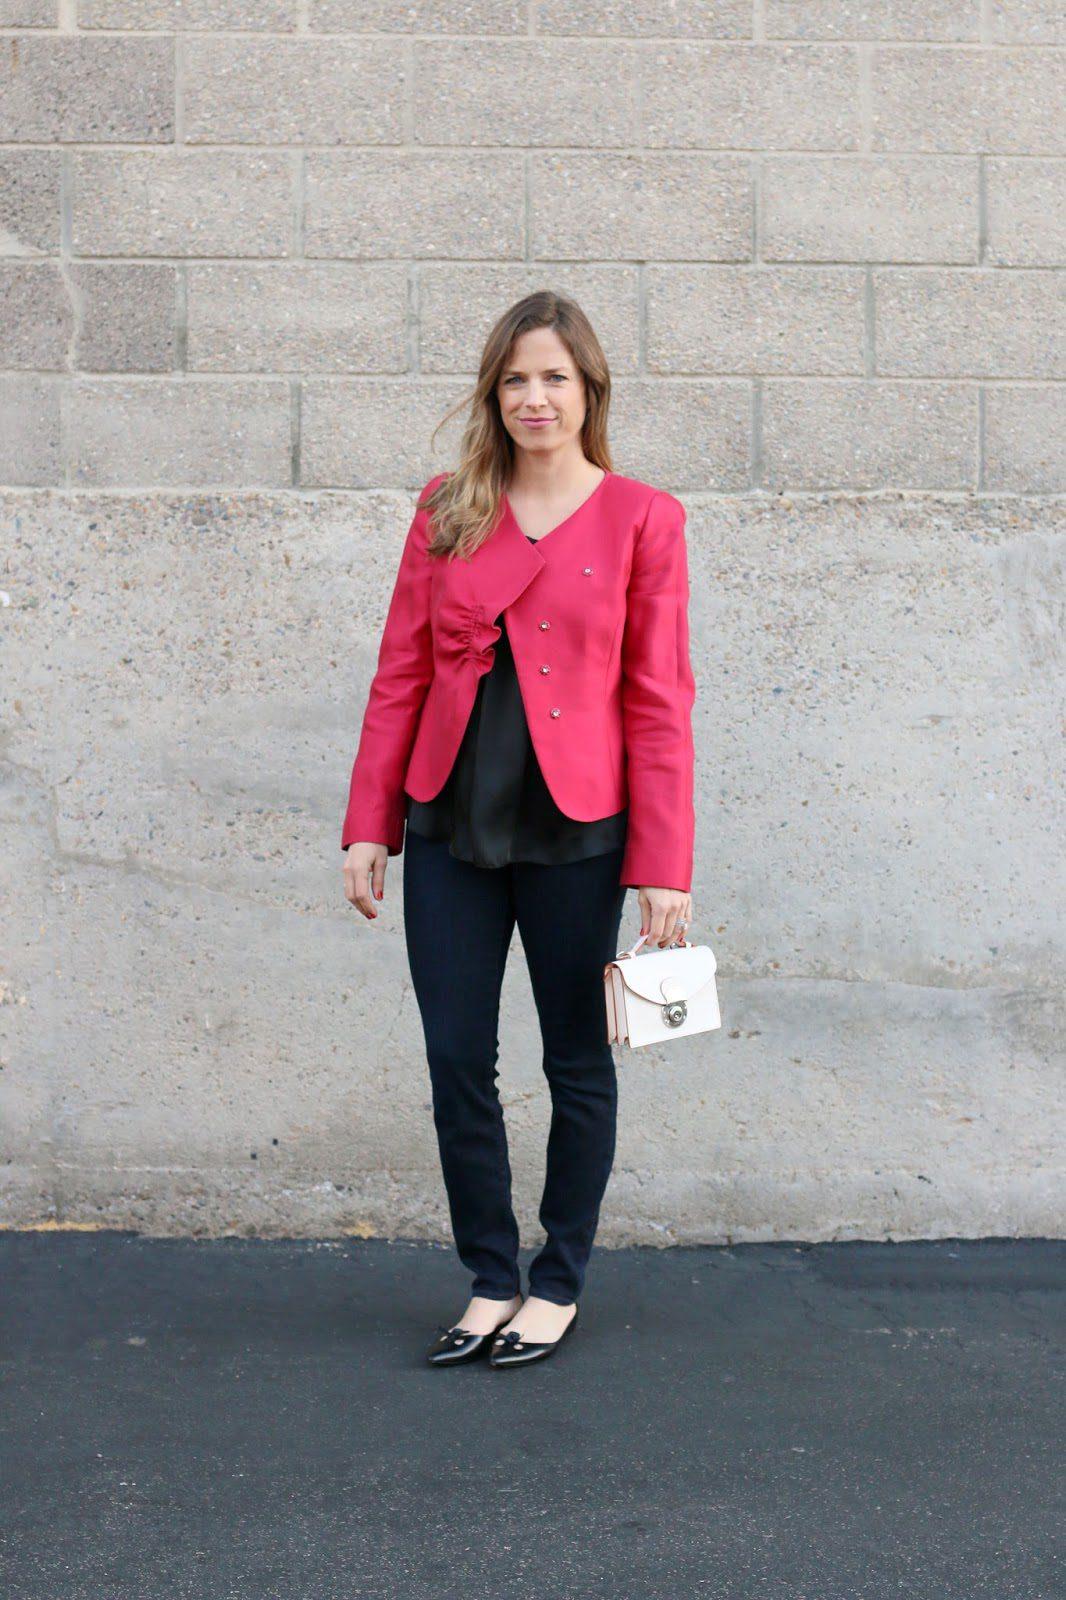 armani red jacket